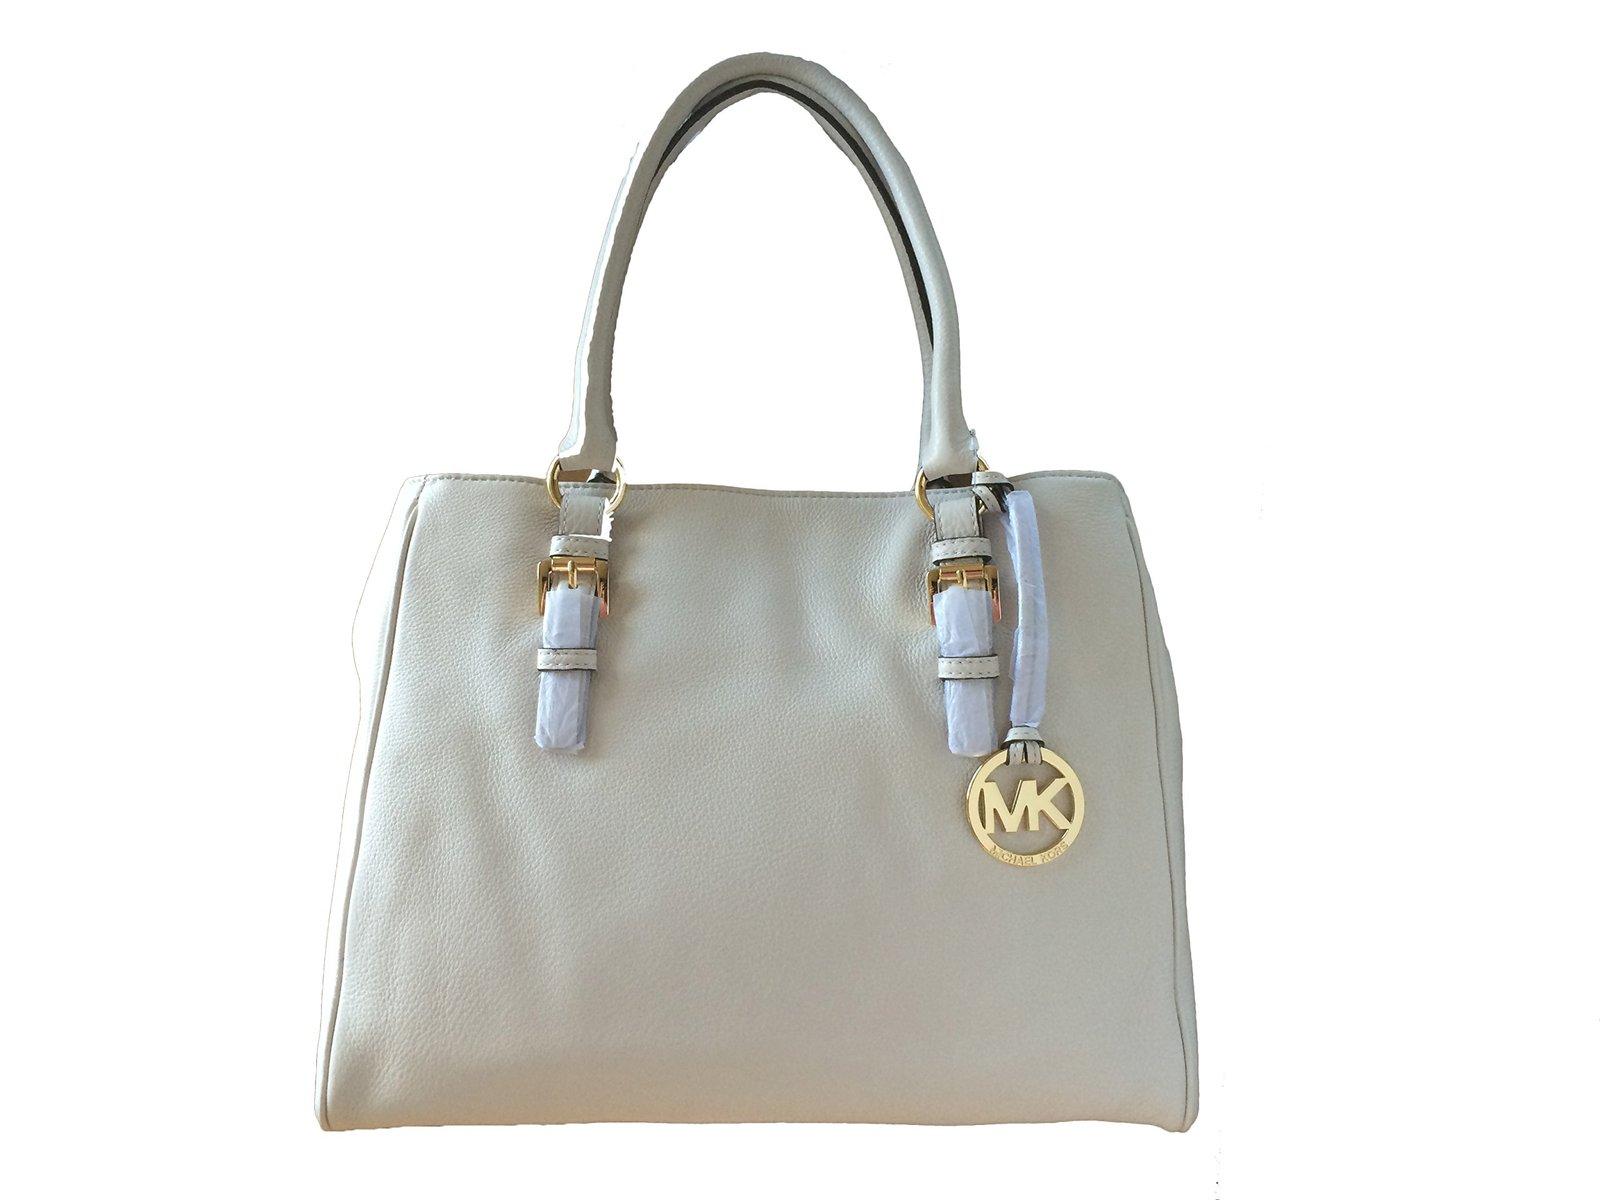 Michael Kors Jet Set Item Medium Work Tote in Vanilla Pebbled Leather - $220.99